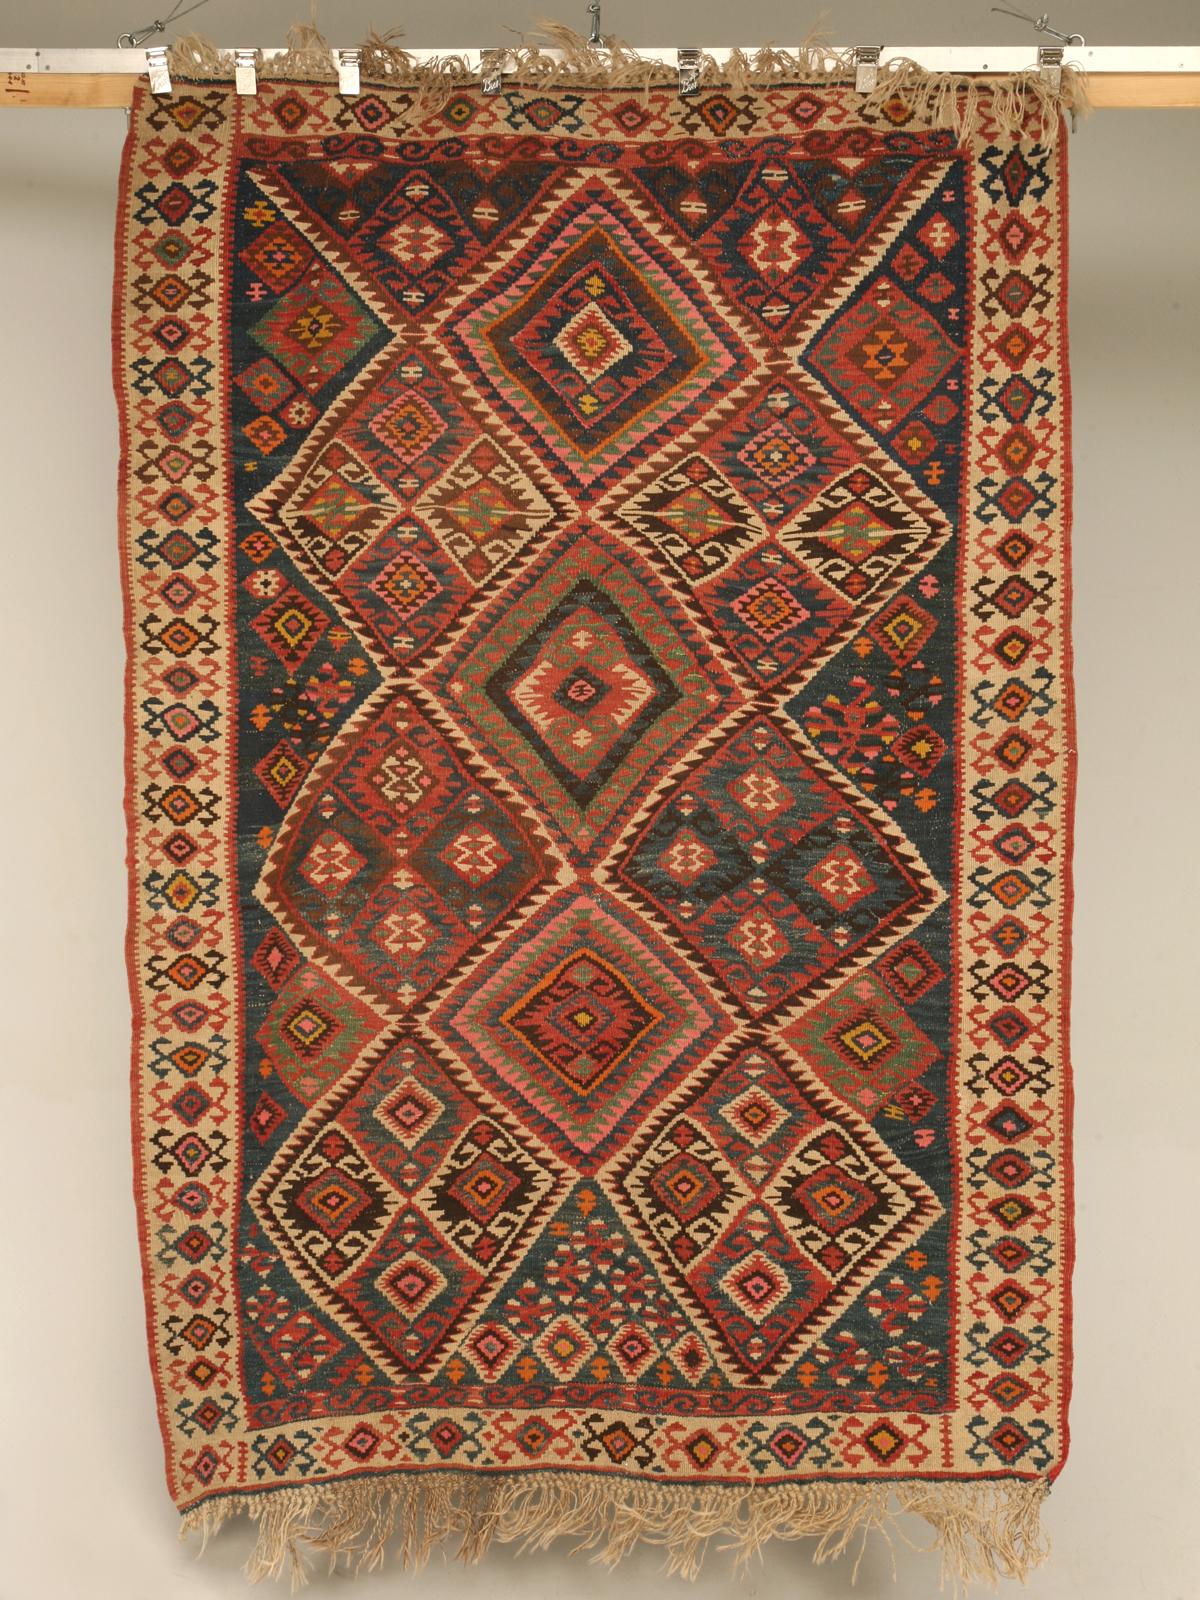 Filevintage turkish kilim geometric patterned rugjpg for Turkish rugs